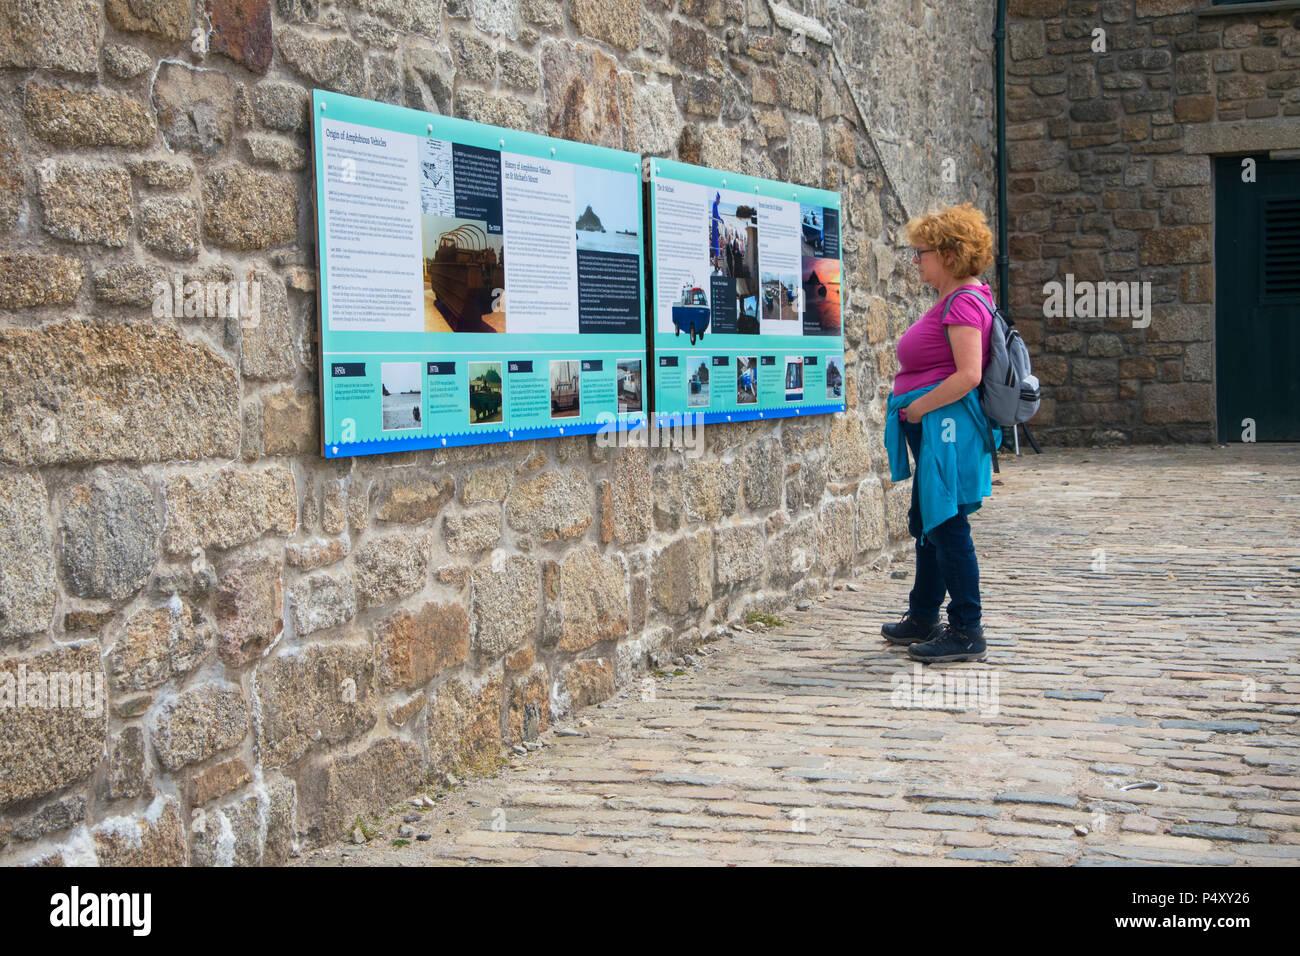 A female tourist reading the interpretation at St. Michael's Mount, Cornwall, UK - John Gollop - Stock Image